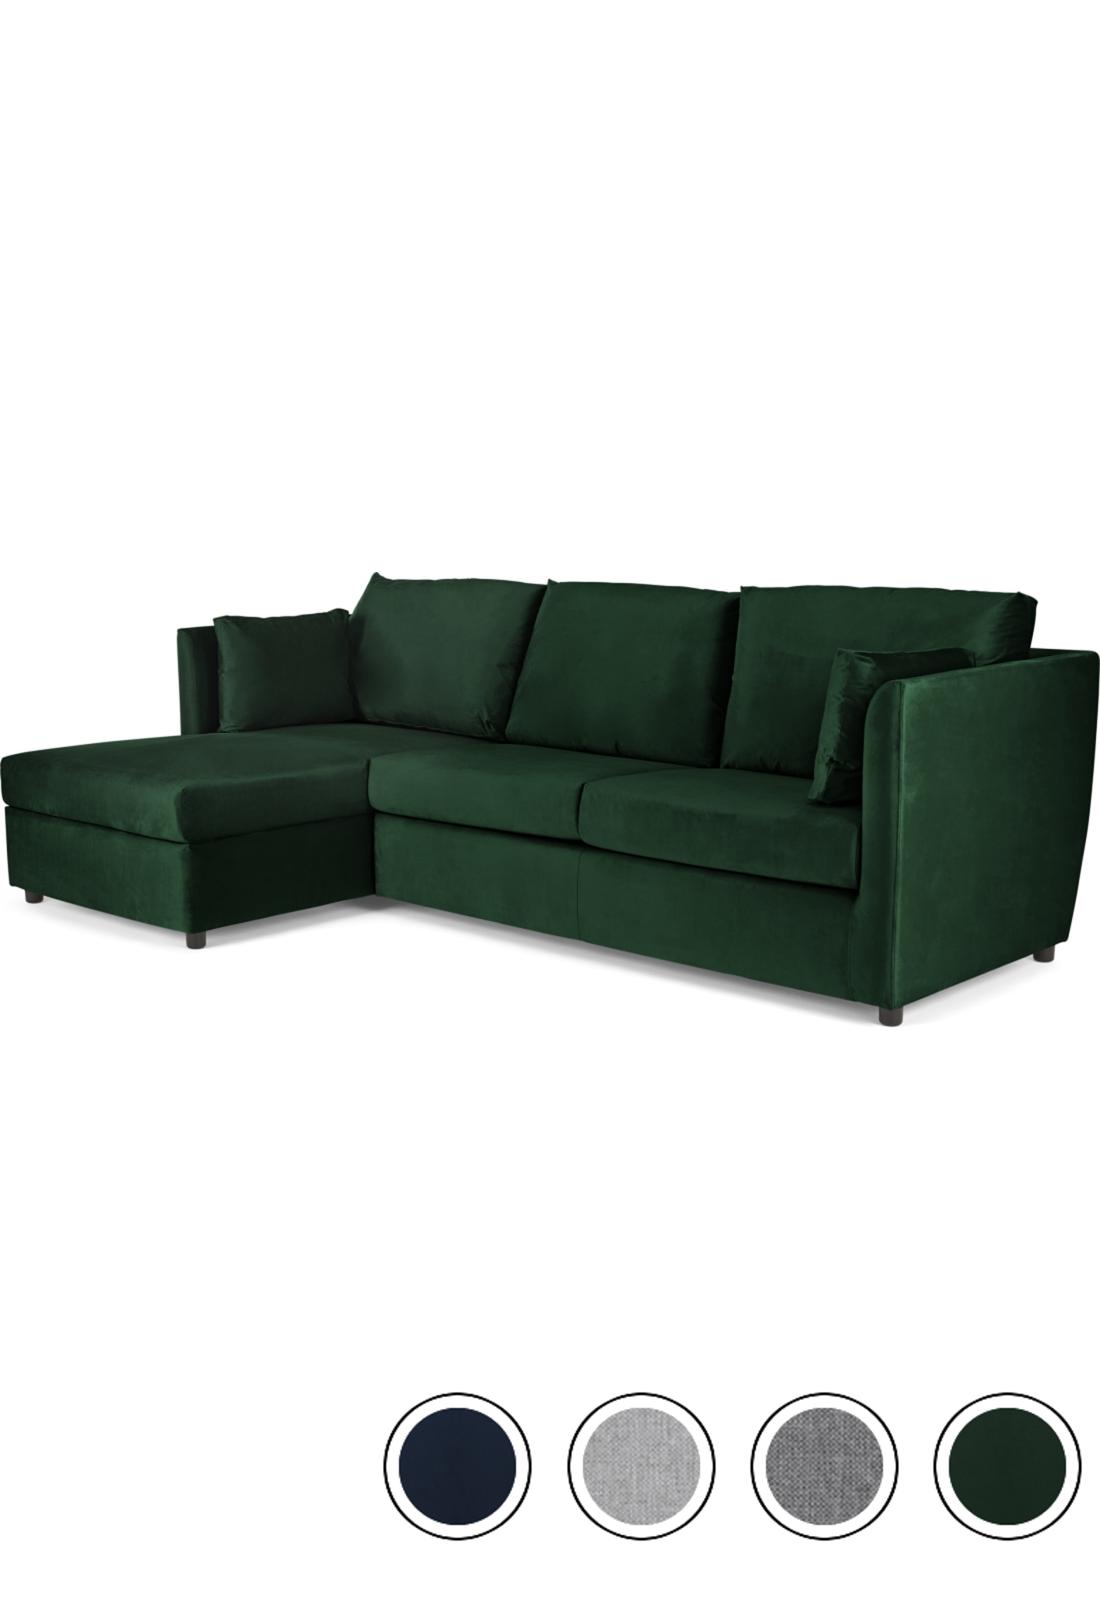 Made Bottle Green Velvet Corner Sofa Bed Foam Mattress Sofa Bed Corner Storage